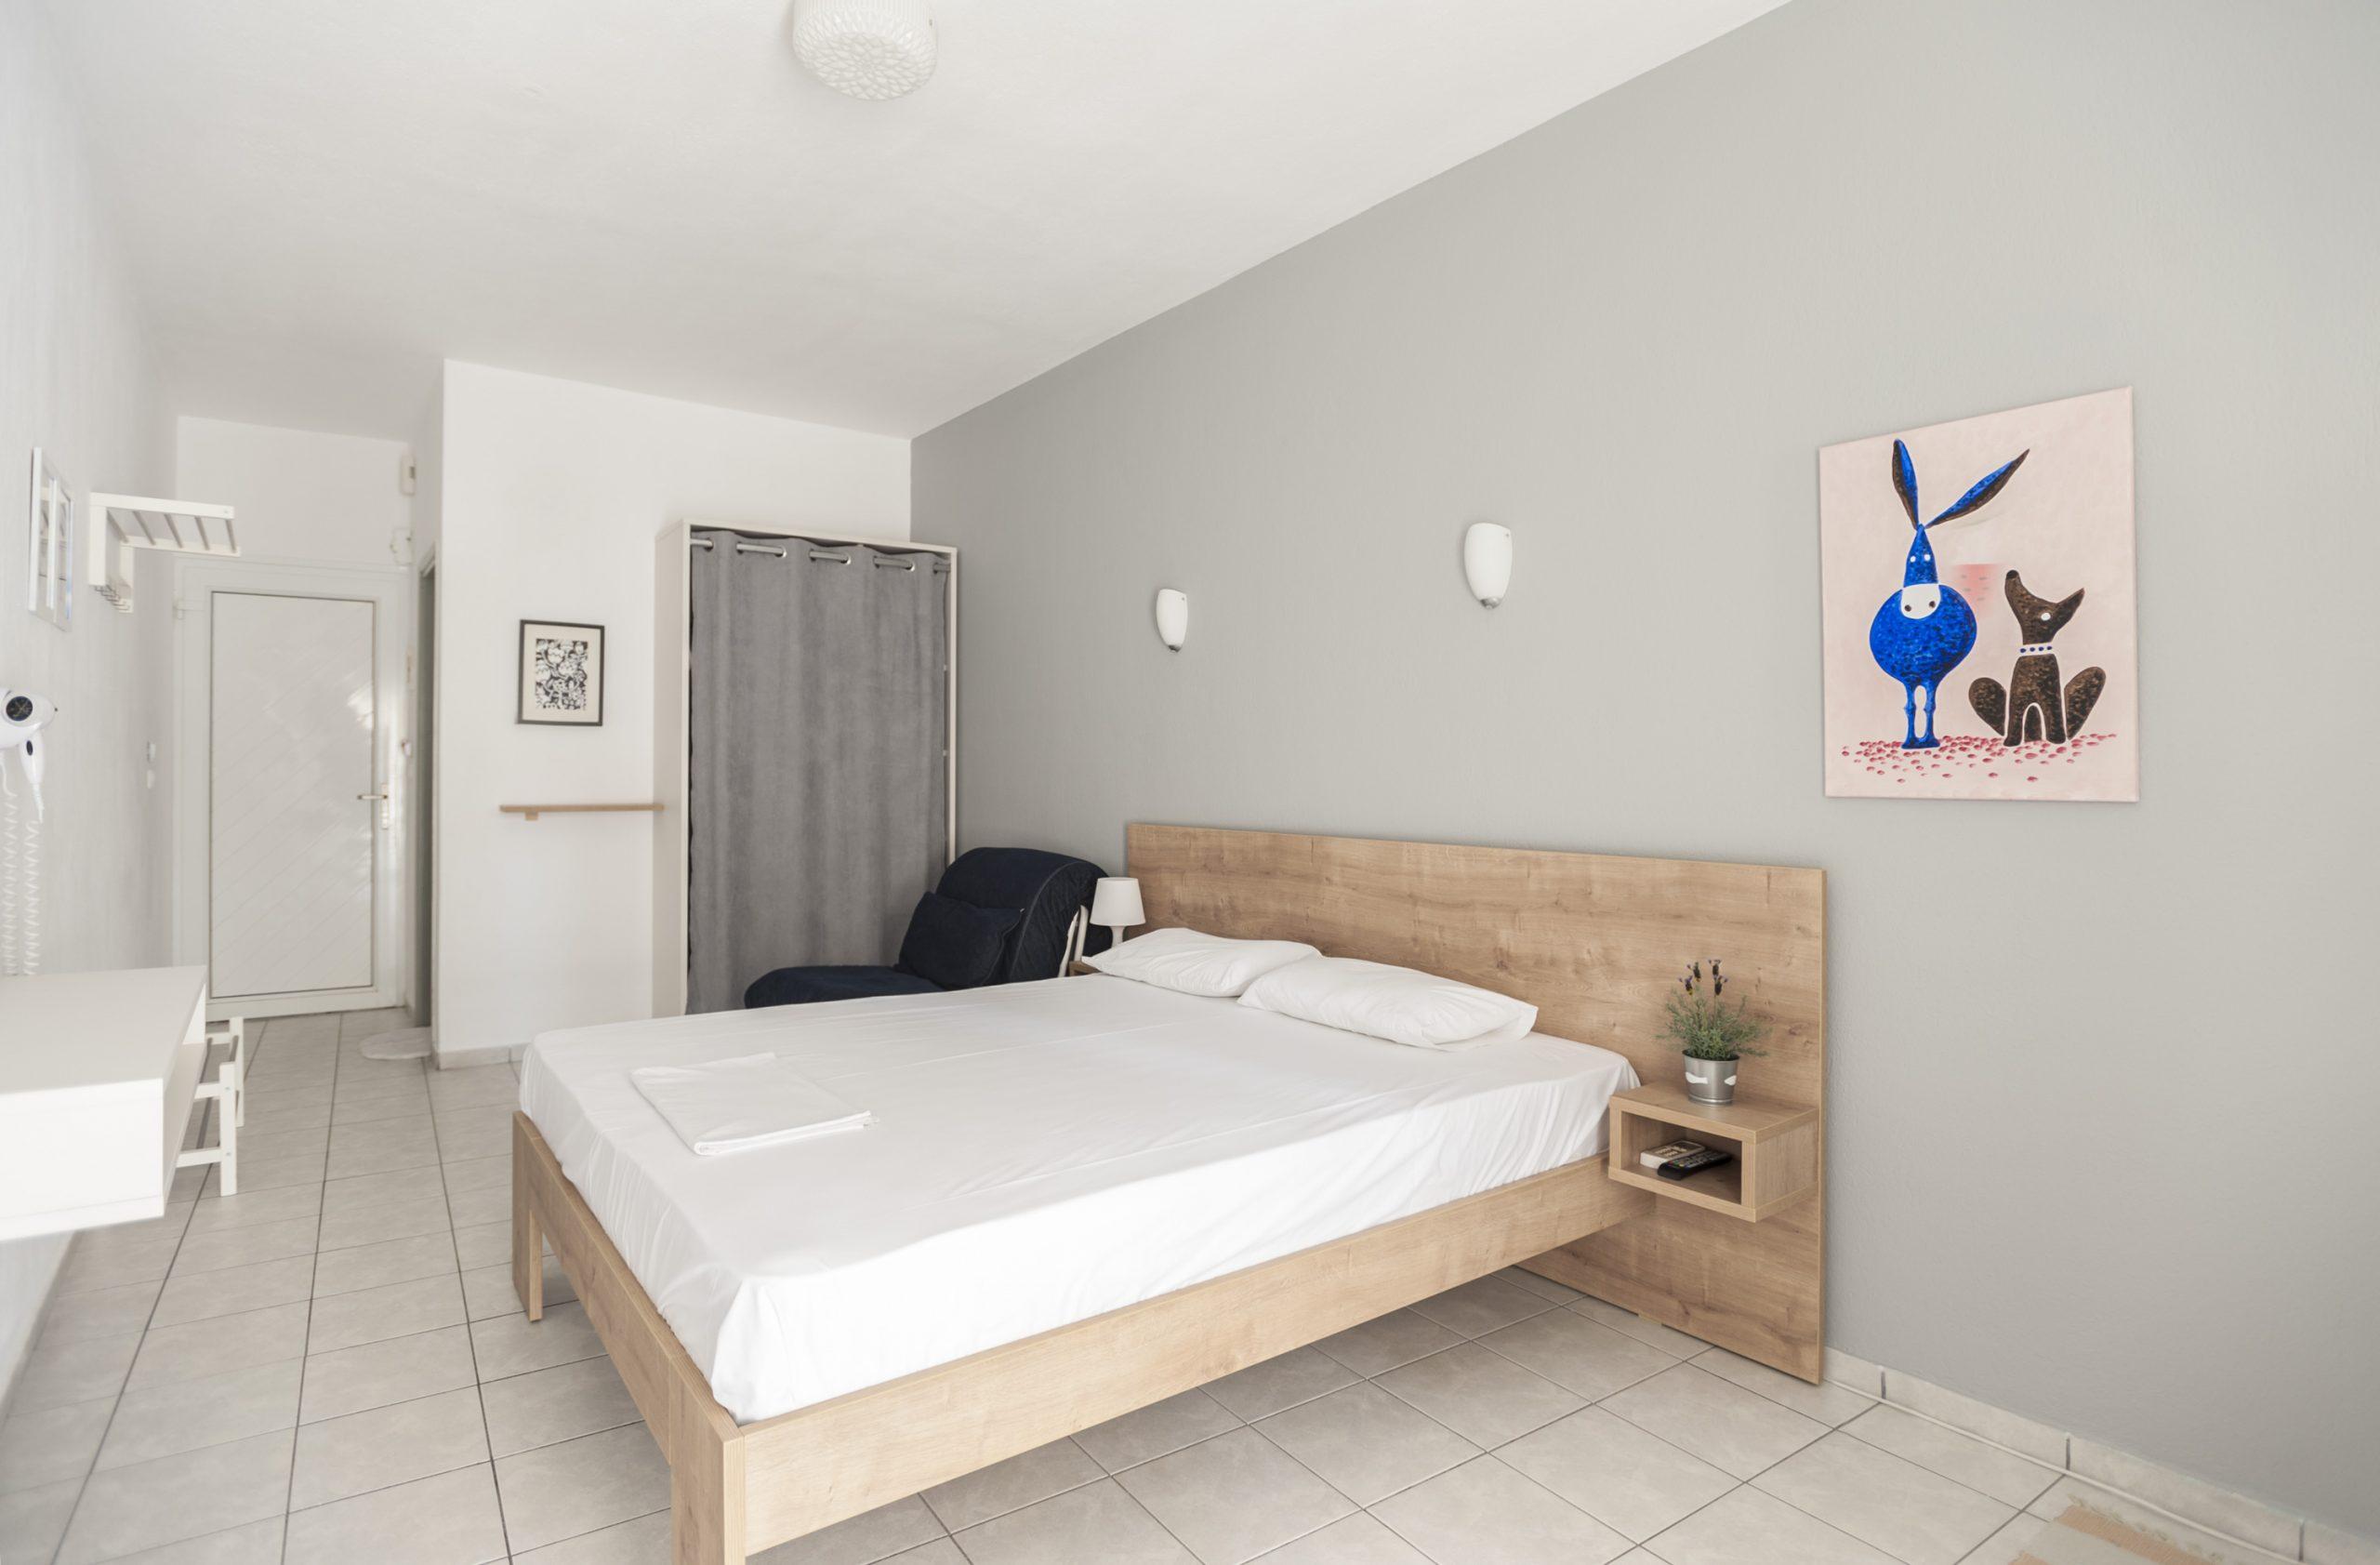 Afkos_rooms_013-1